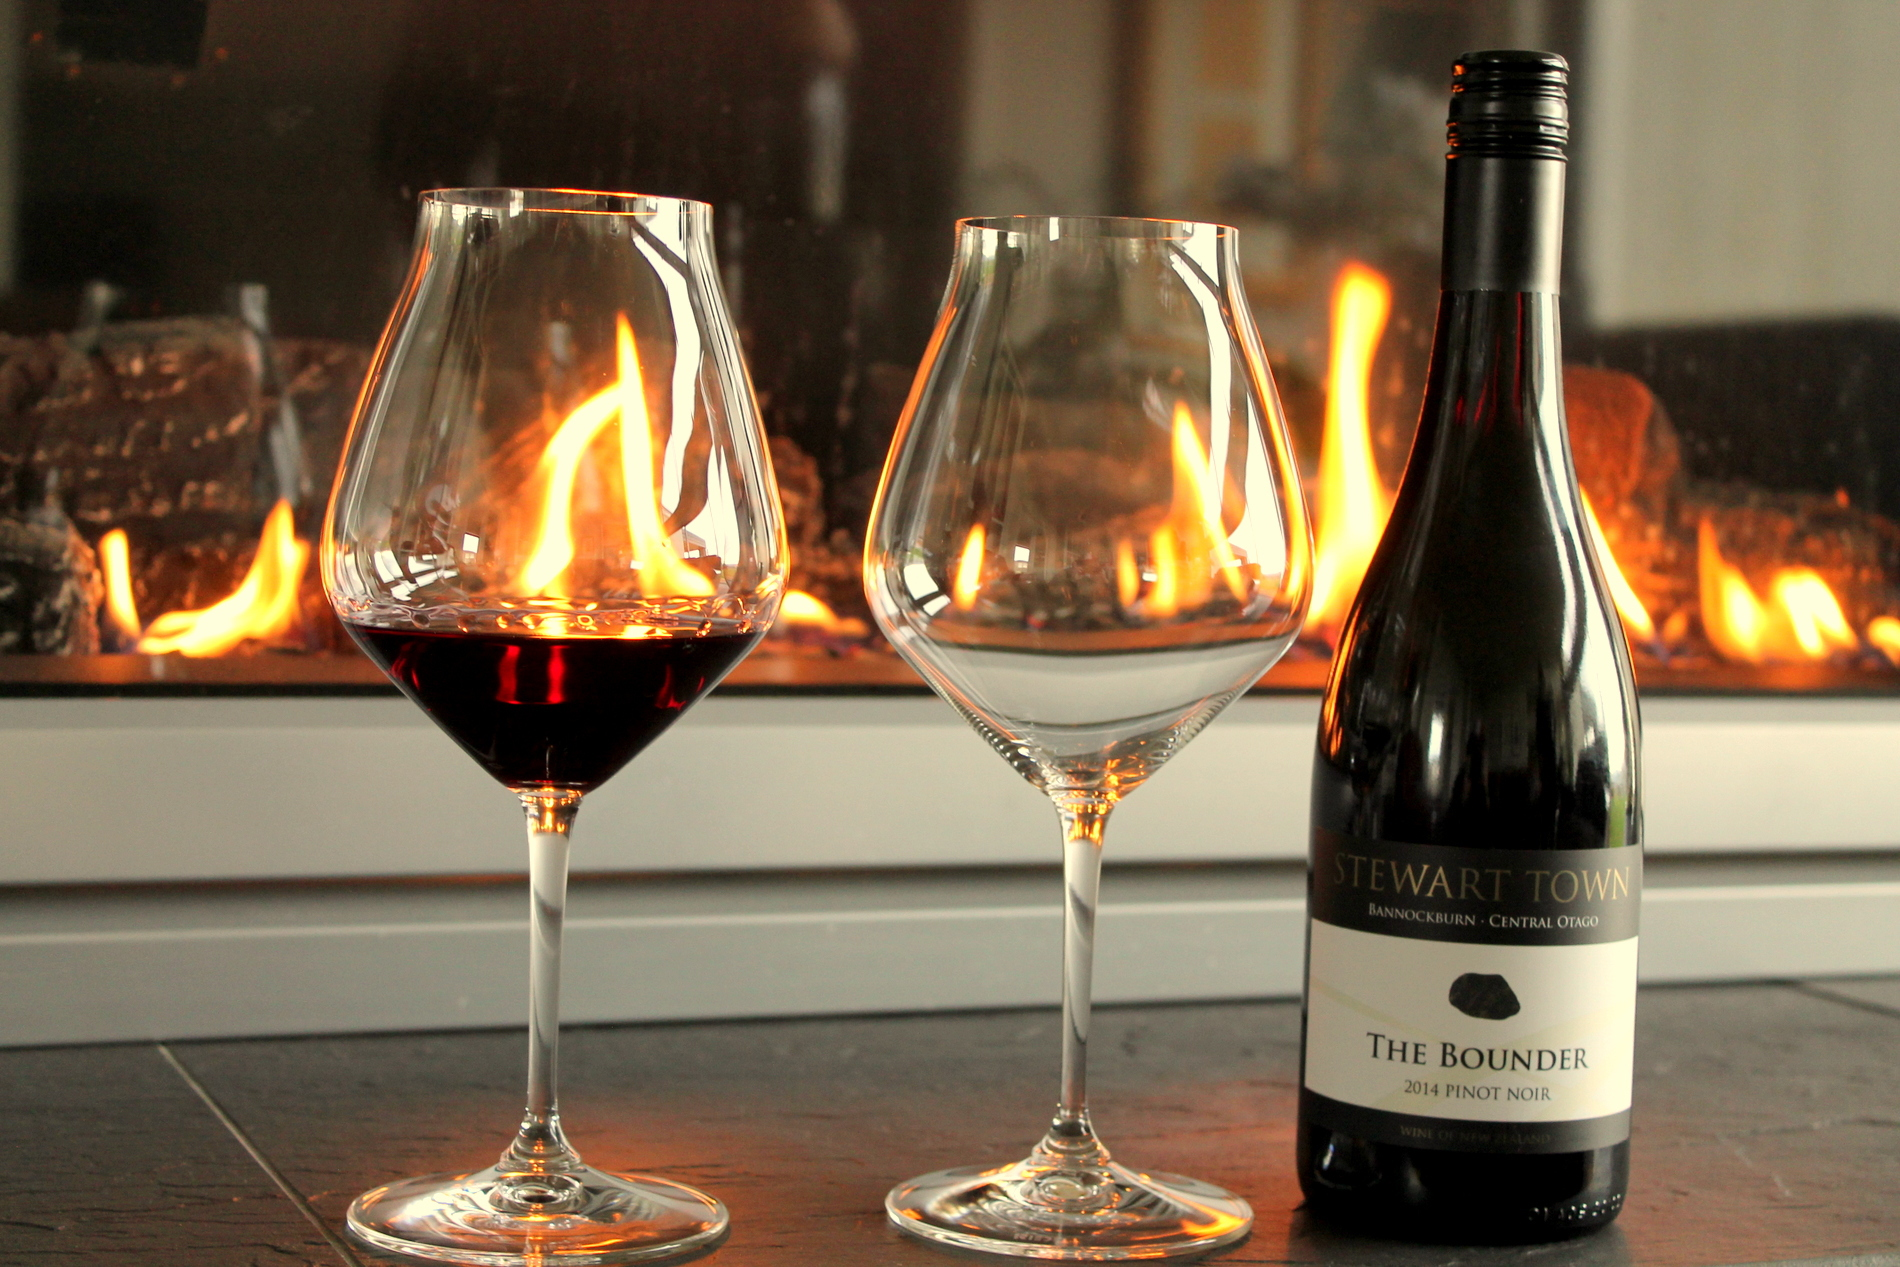 Stewart Town Vineyard, Winery, Wines, New Zealand Wine, Export Wine, Exclusive, Weddings, Central Otago, Cromwell, Queenstown, Corporate